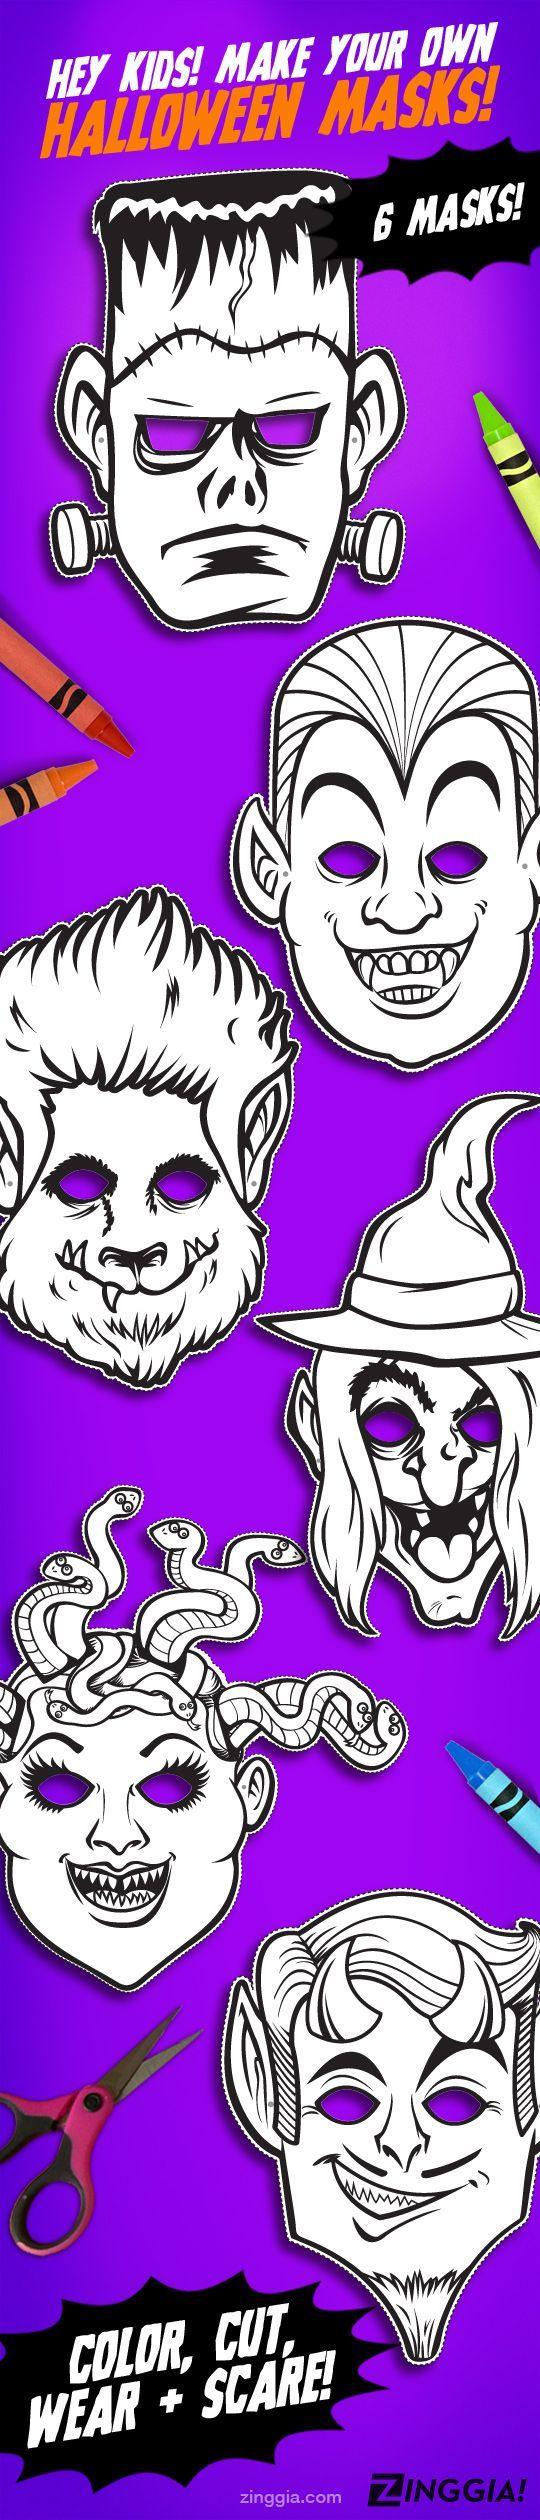 PRINTABLE PDF Monster Coloring Masks, kids paper halloween masks, DIY halloween costume, film monsters, great for Halloween parties for kids to color, devil, medusa, dracula, vampire, frankenstein monster, wolfman werewolf, witch, instant download, ZINGGI